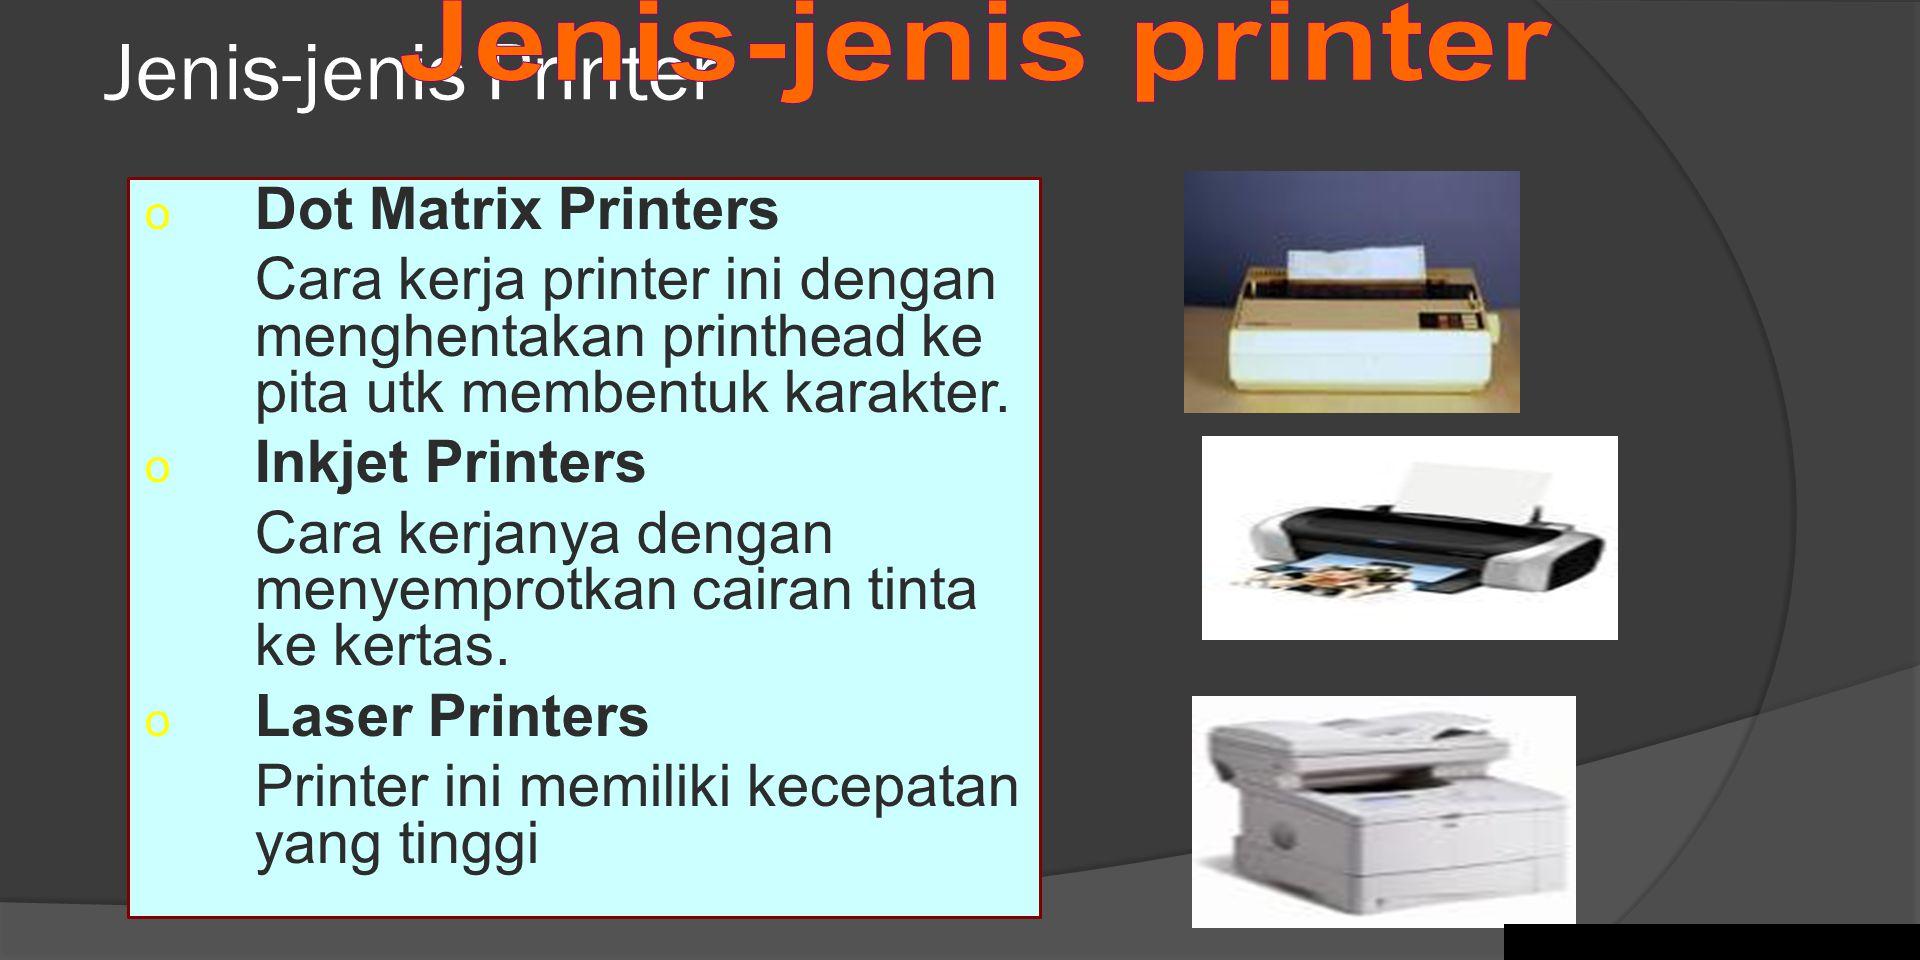 Jenis-jenis printer Jenis-jenis Printer Dot Matrix Printers